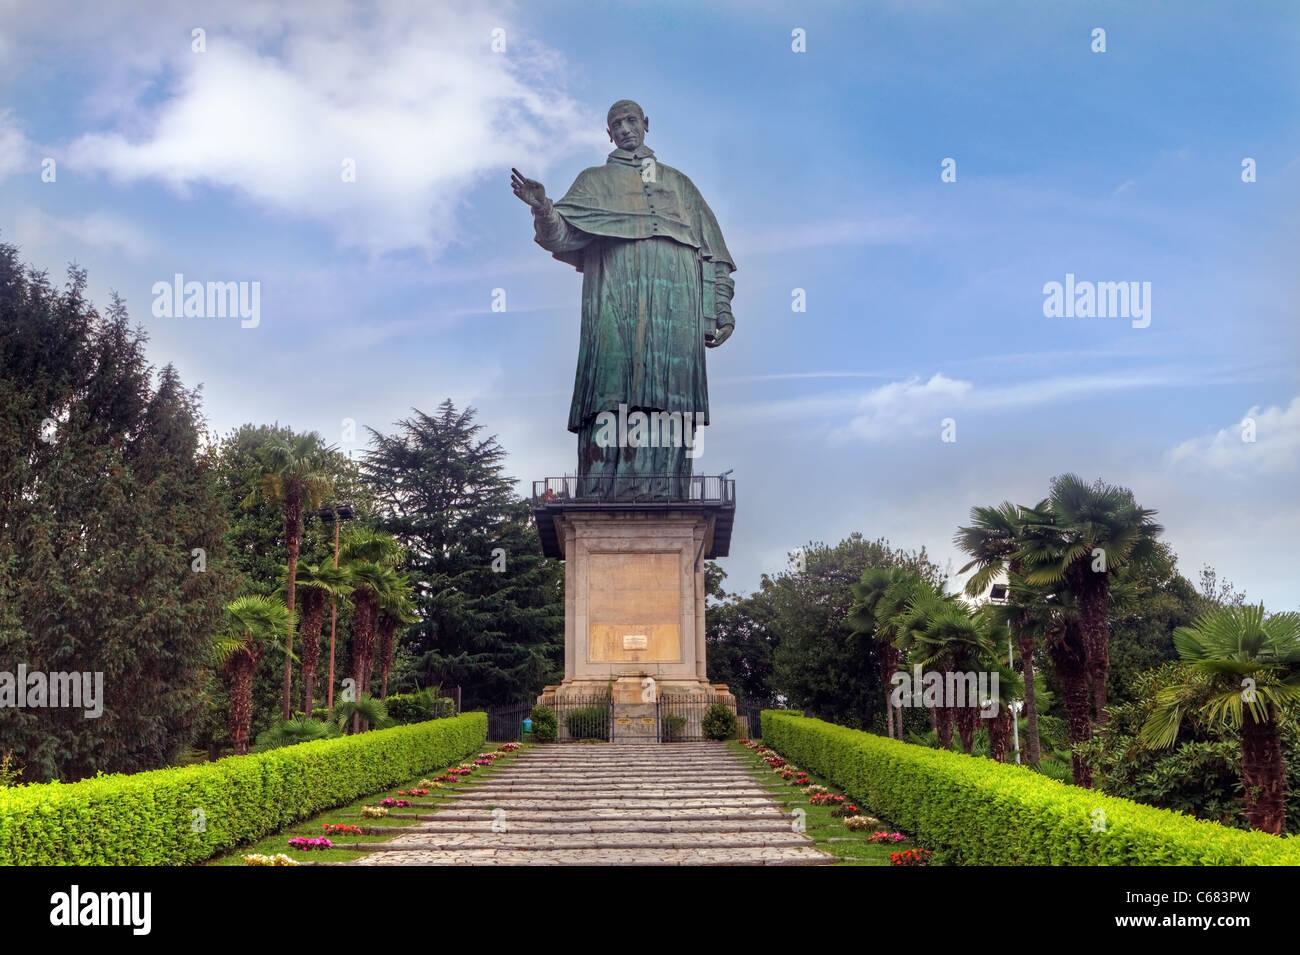 Colossal statue of Charles Borromeo in Arona, Italy - Stock Image